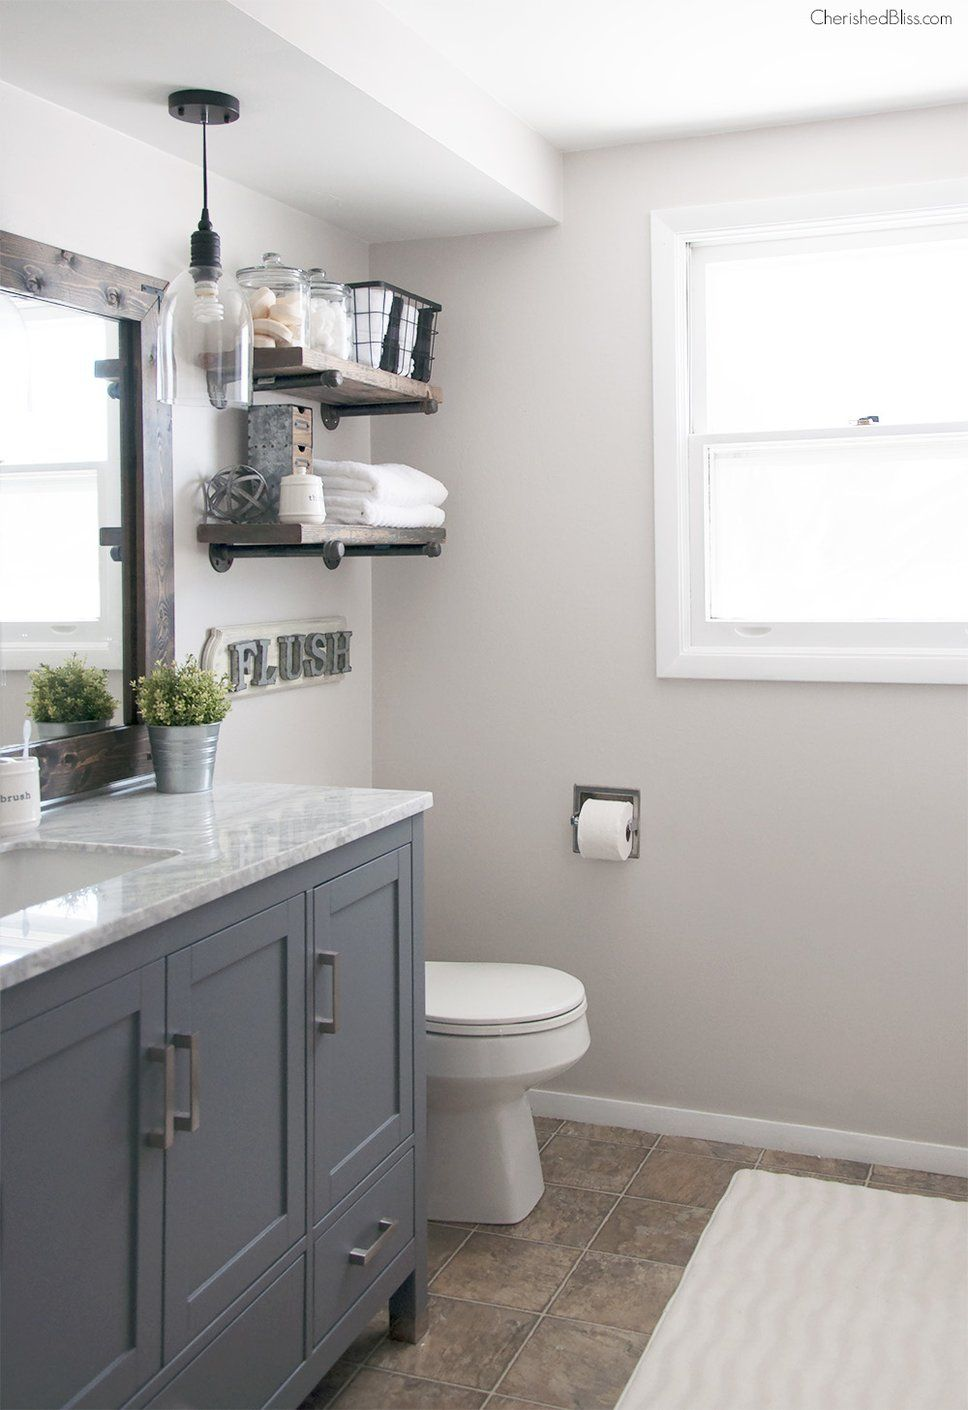 Cottage/Country Bathroom Design | La maison | Pinterest | Bathroom ...